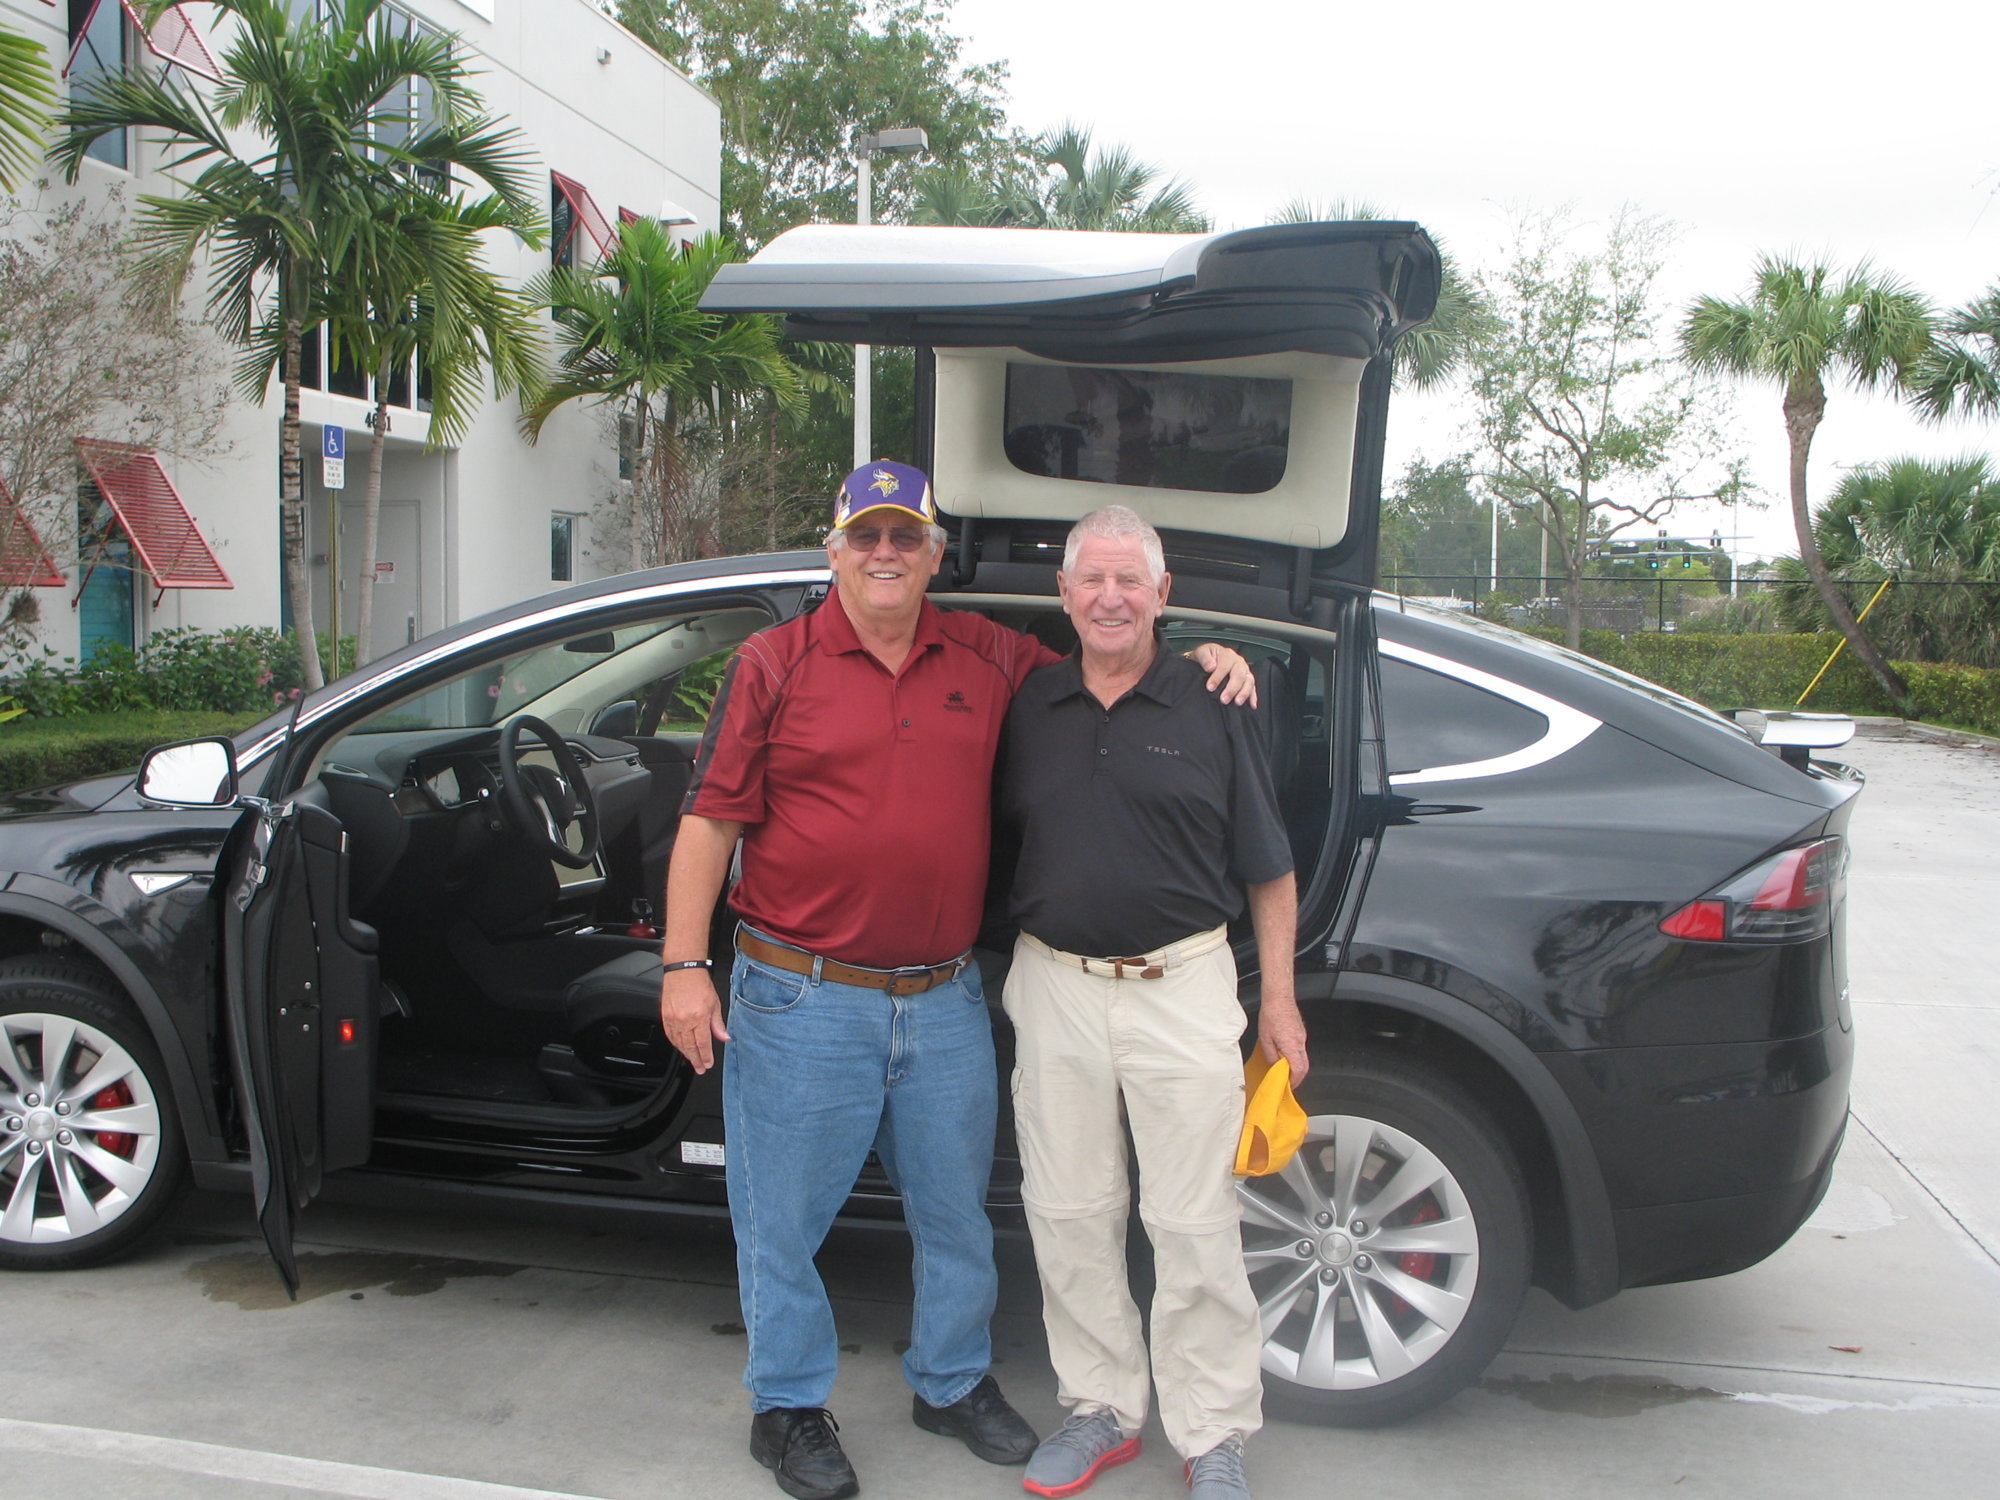 Model S Display West Palm Beach 023.JPG